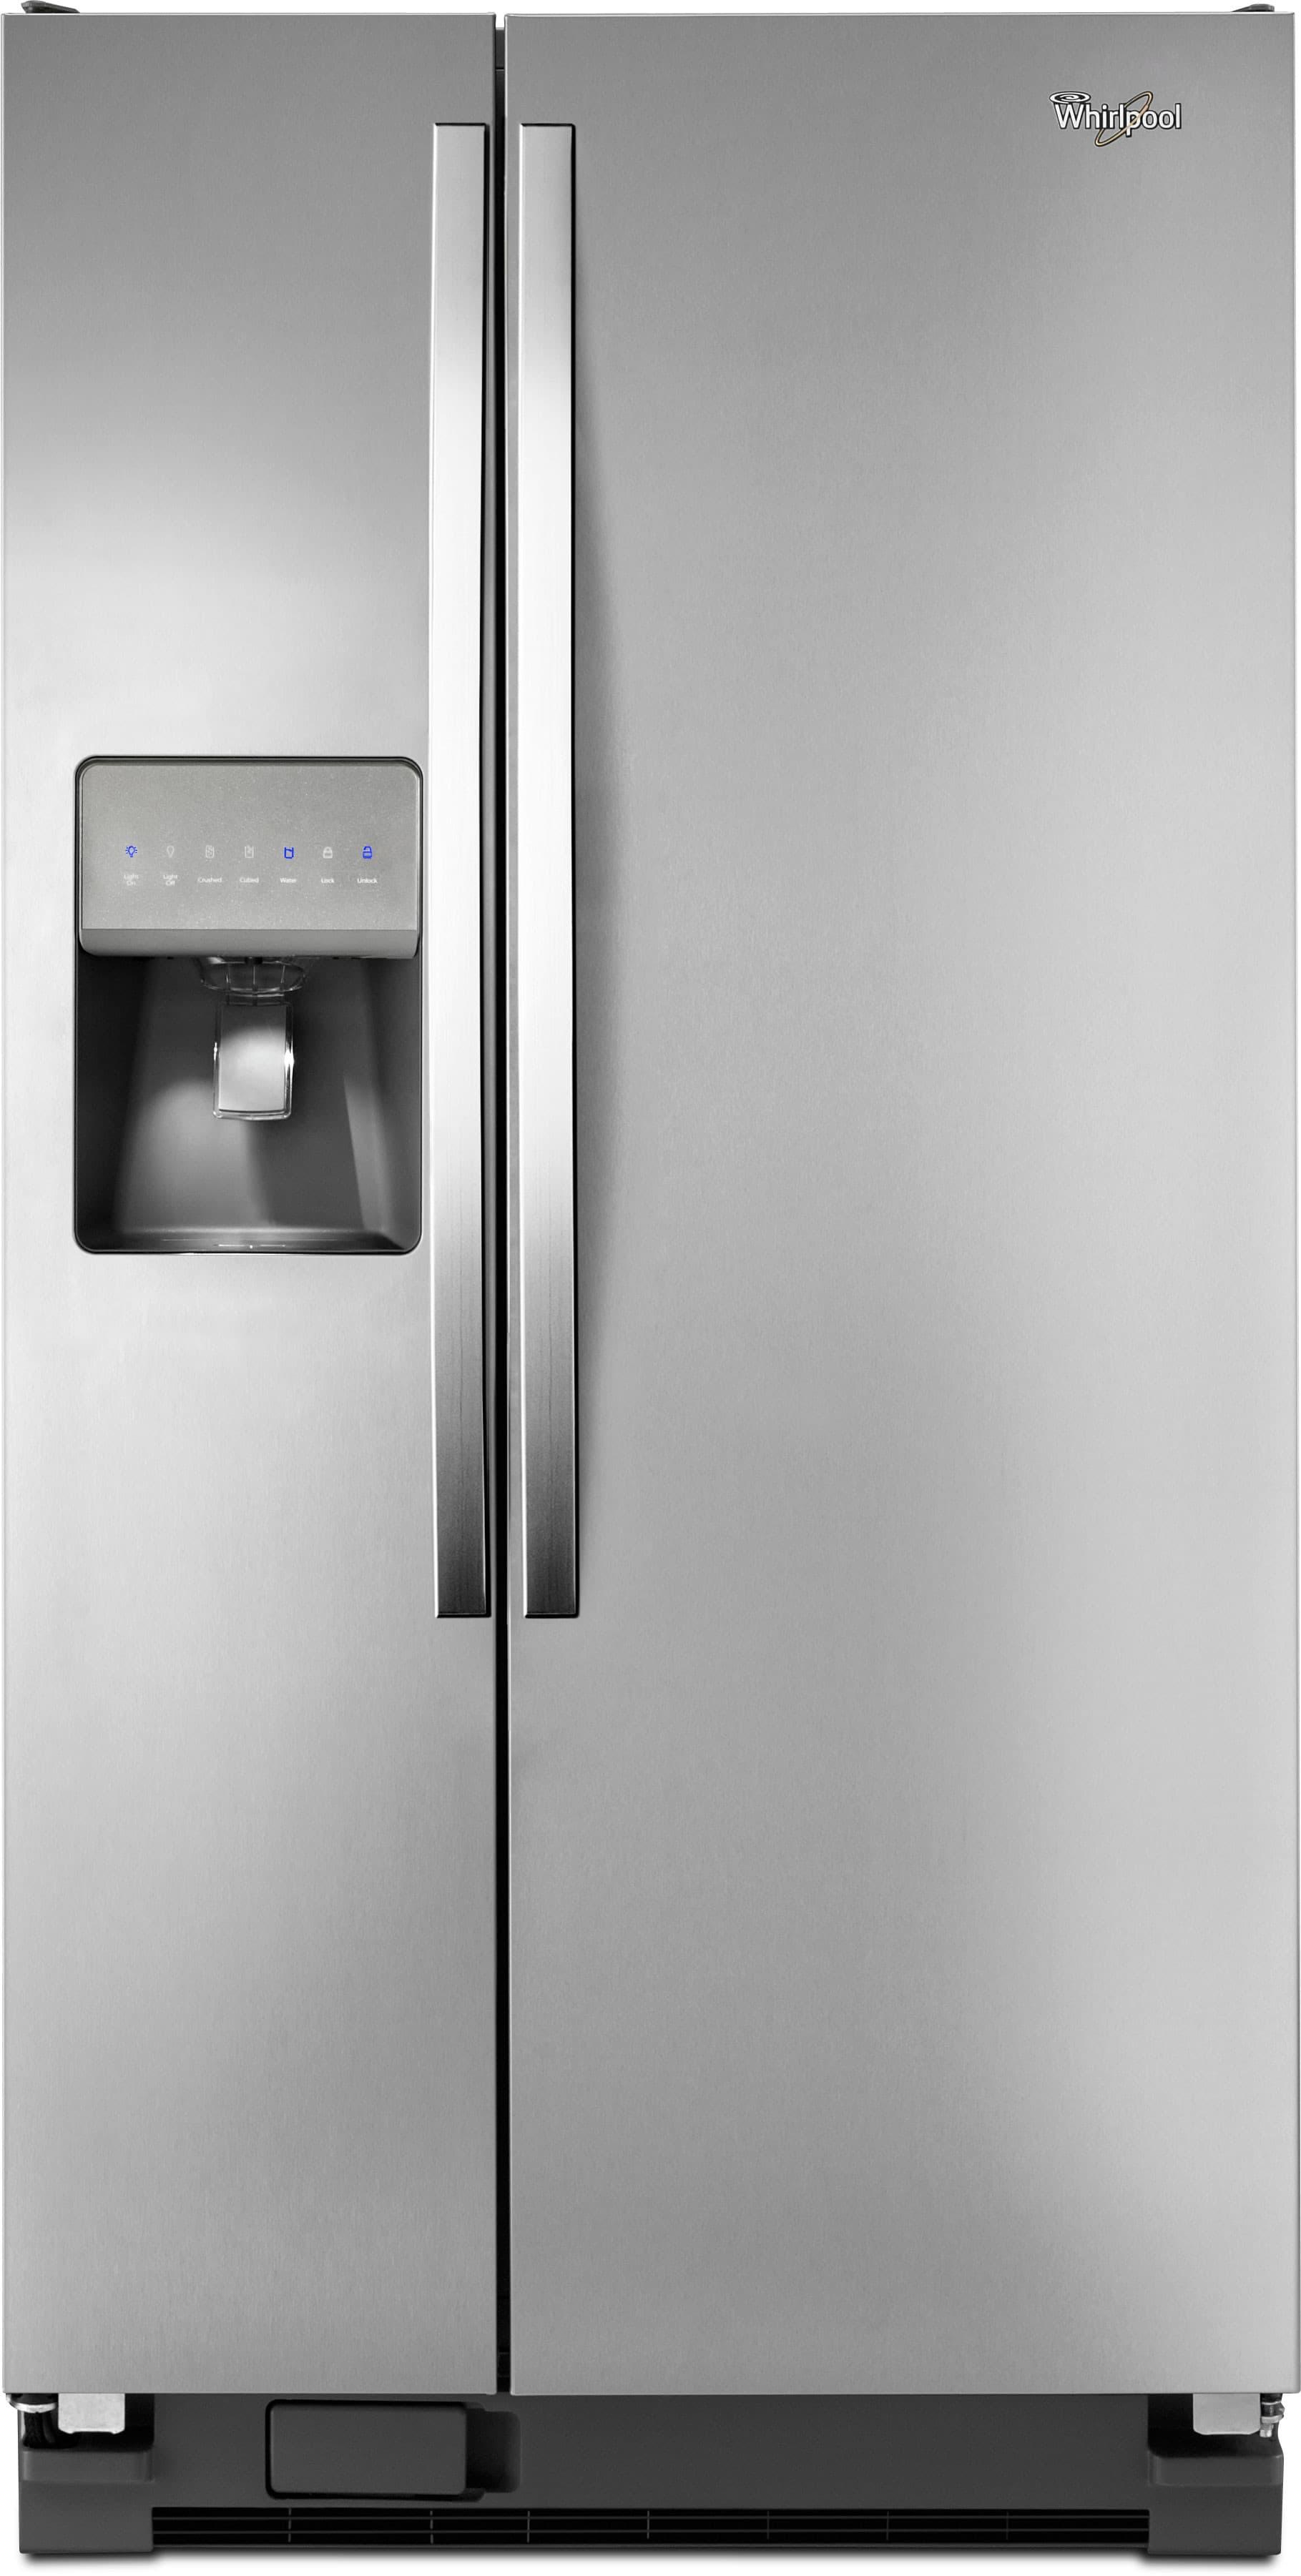 Whirlpool Wrs322fdam 33 Inch Side By Side Refrigerator